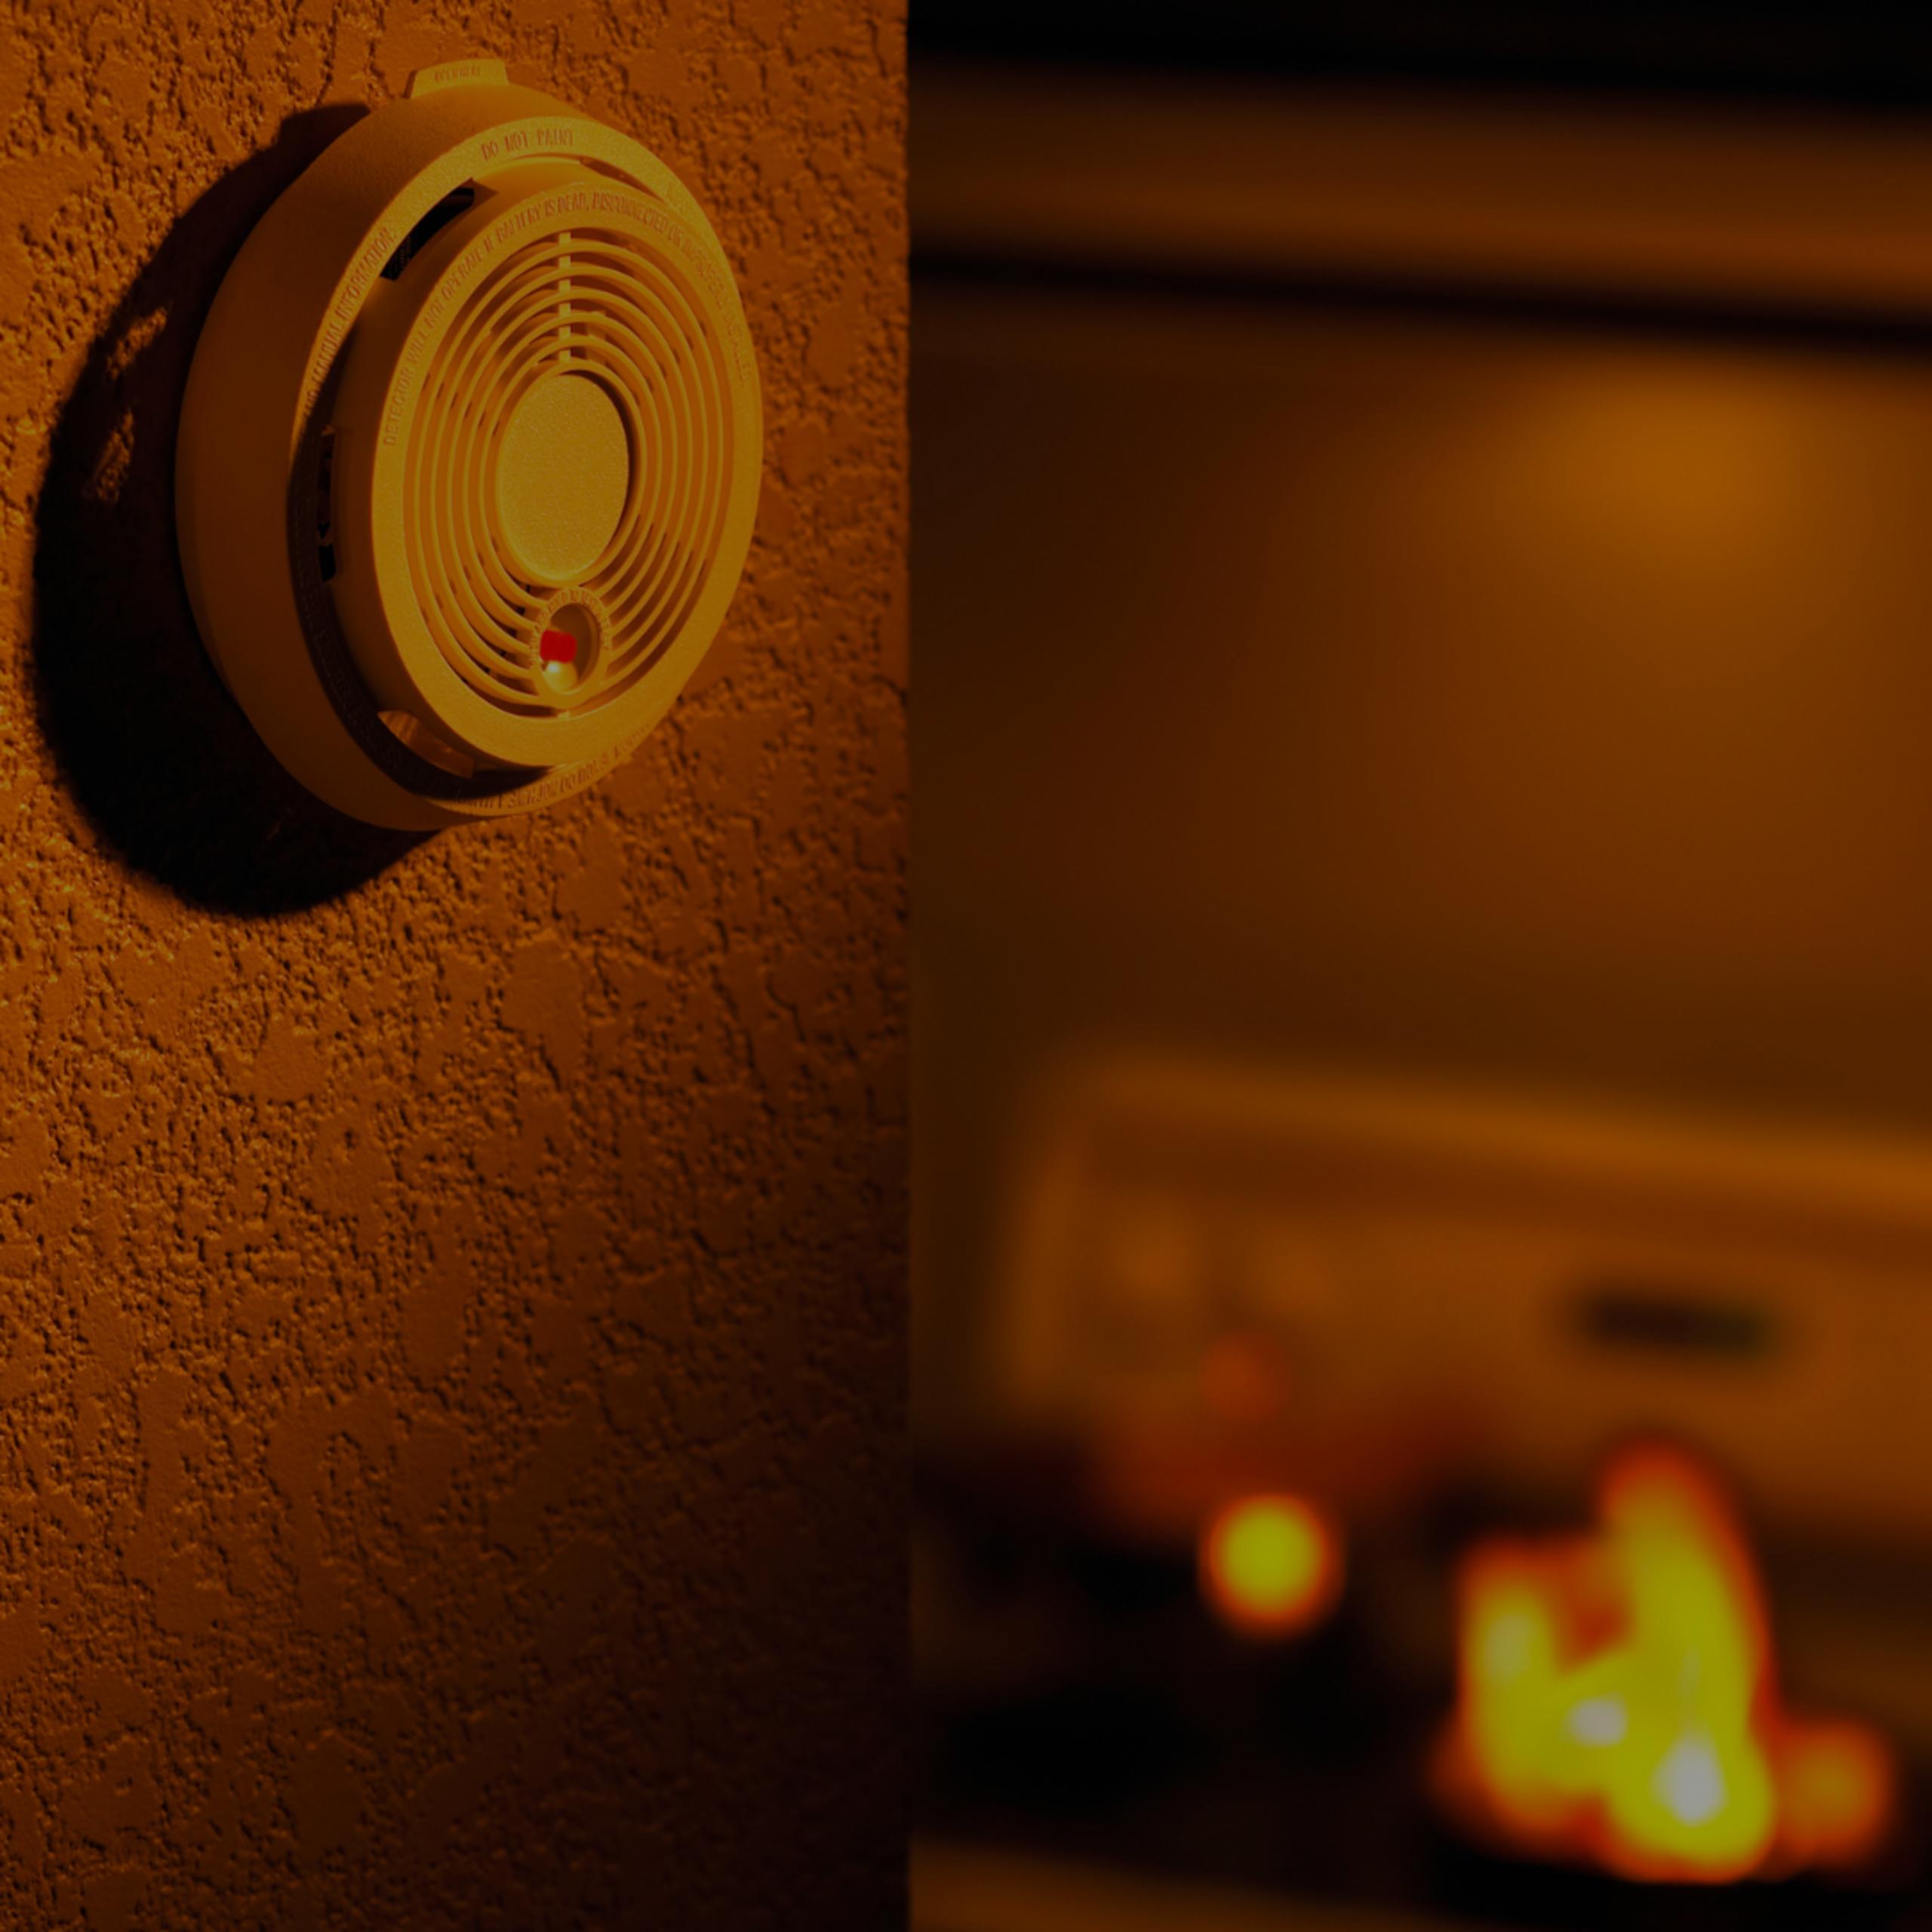 A Look at Smarter Smoke Detectors